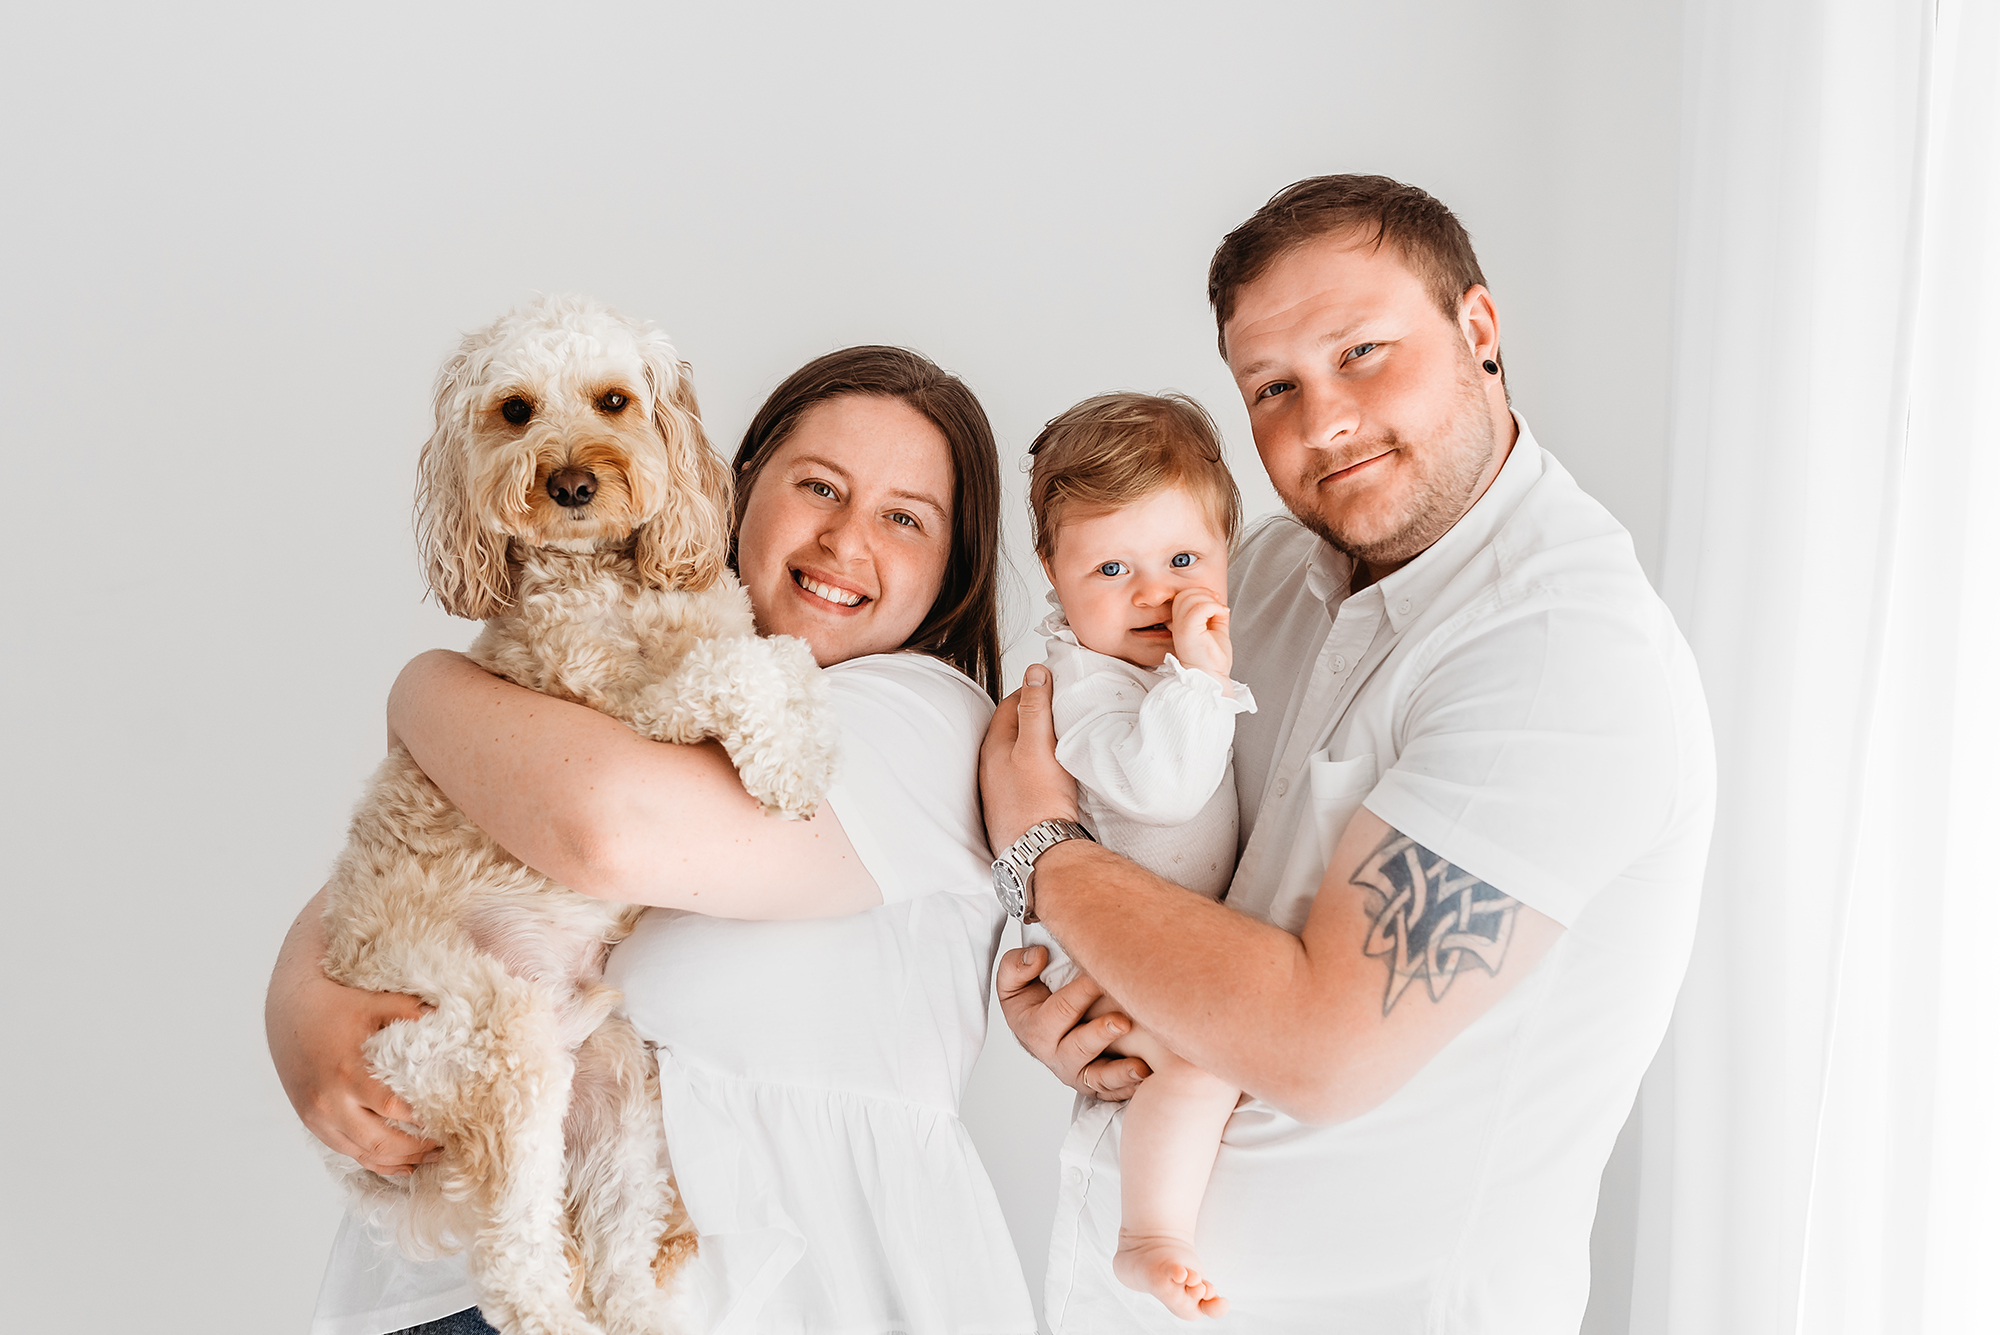 baby photographer Barnsley, family photo with dog